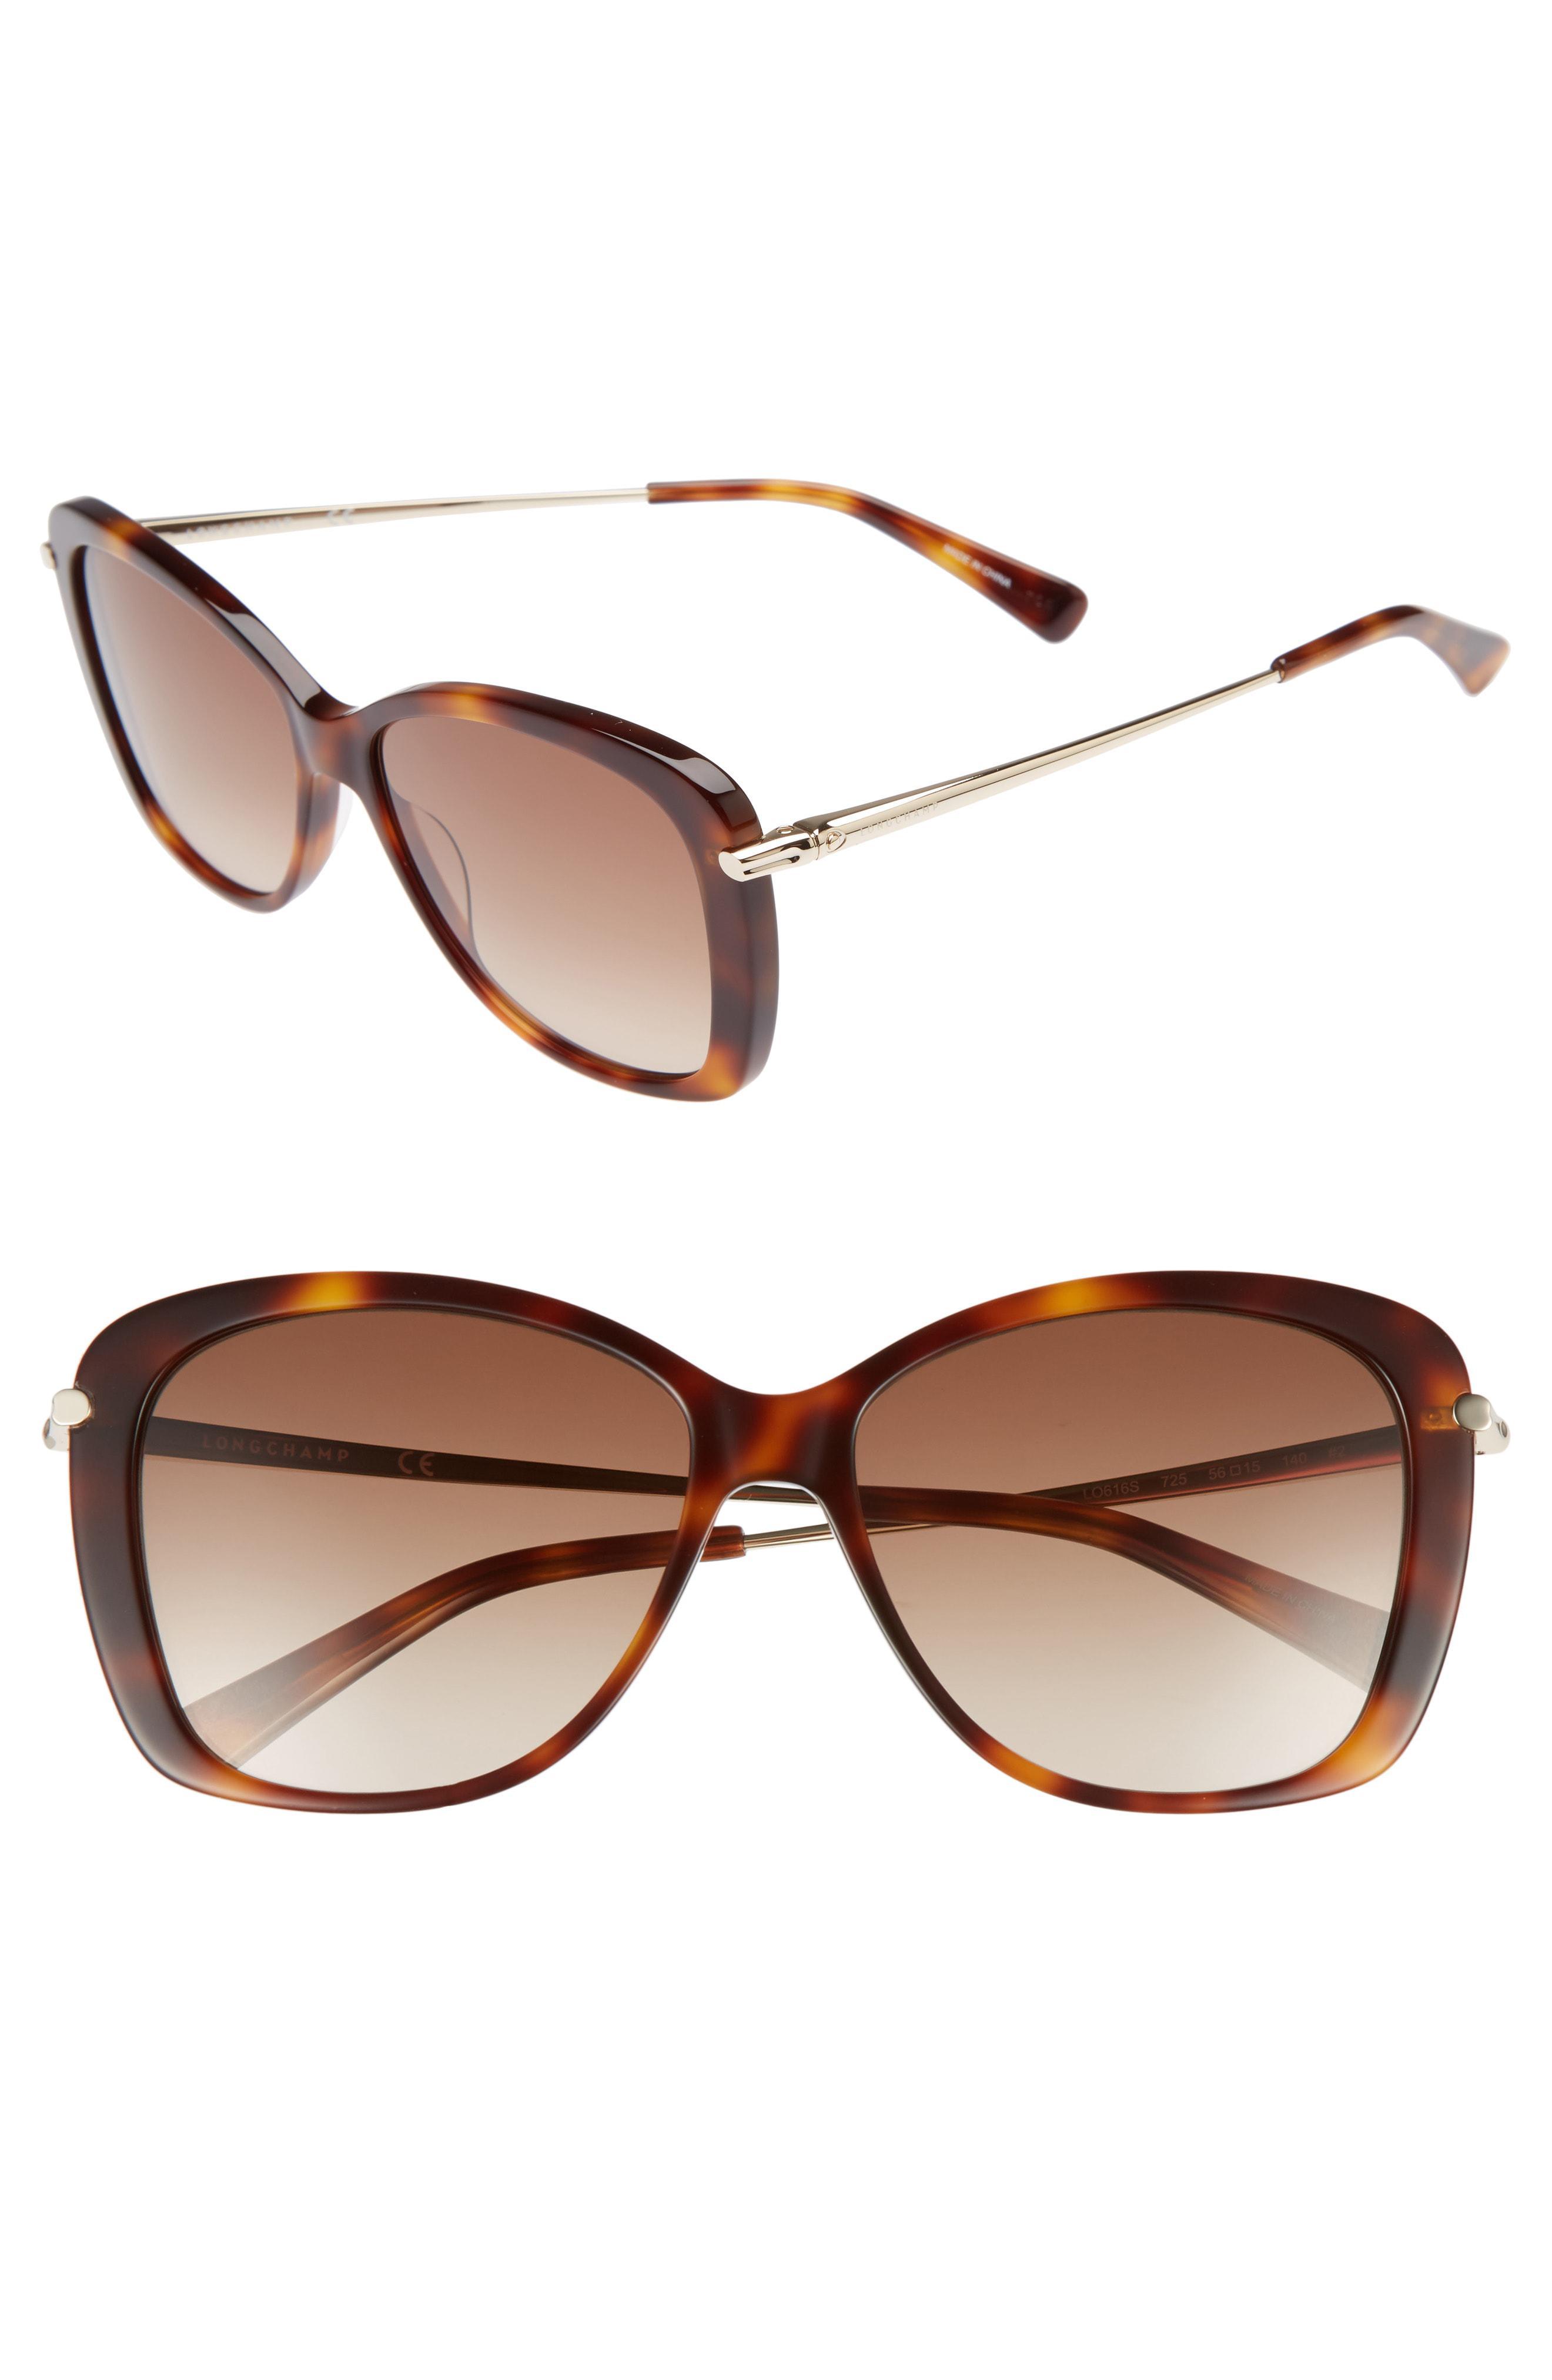 9668abe874 Longchamp - Brown 56mm Gradient Lens Butterfly Sunglasses - Blonde Havana -  Lyst. View fullscreen